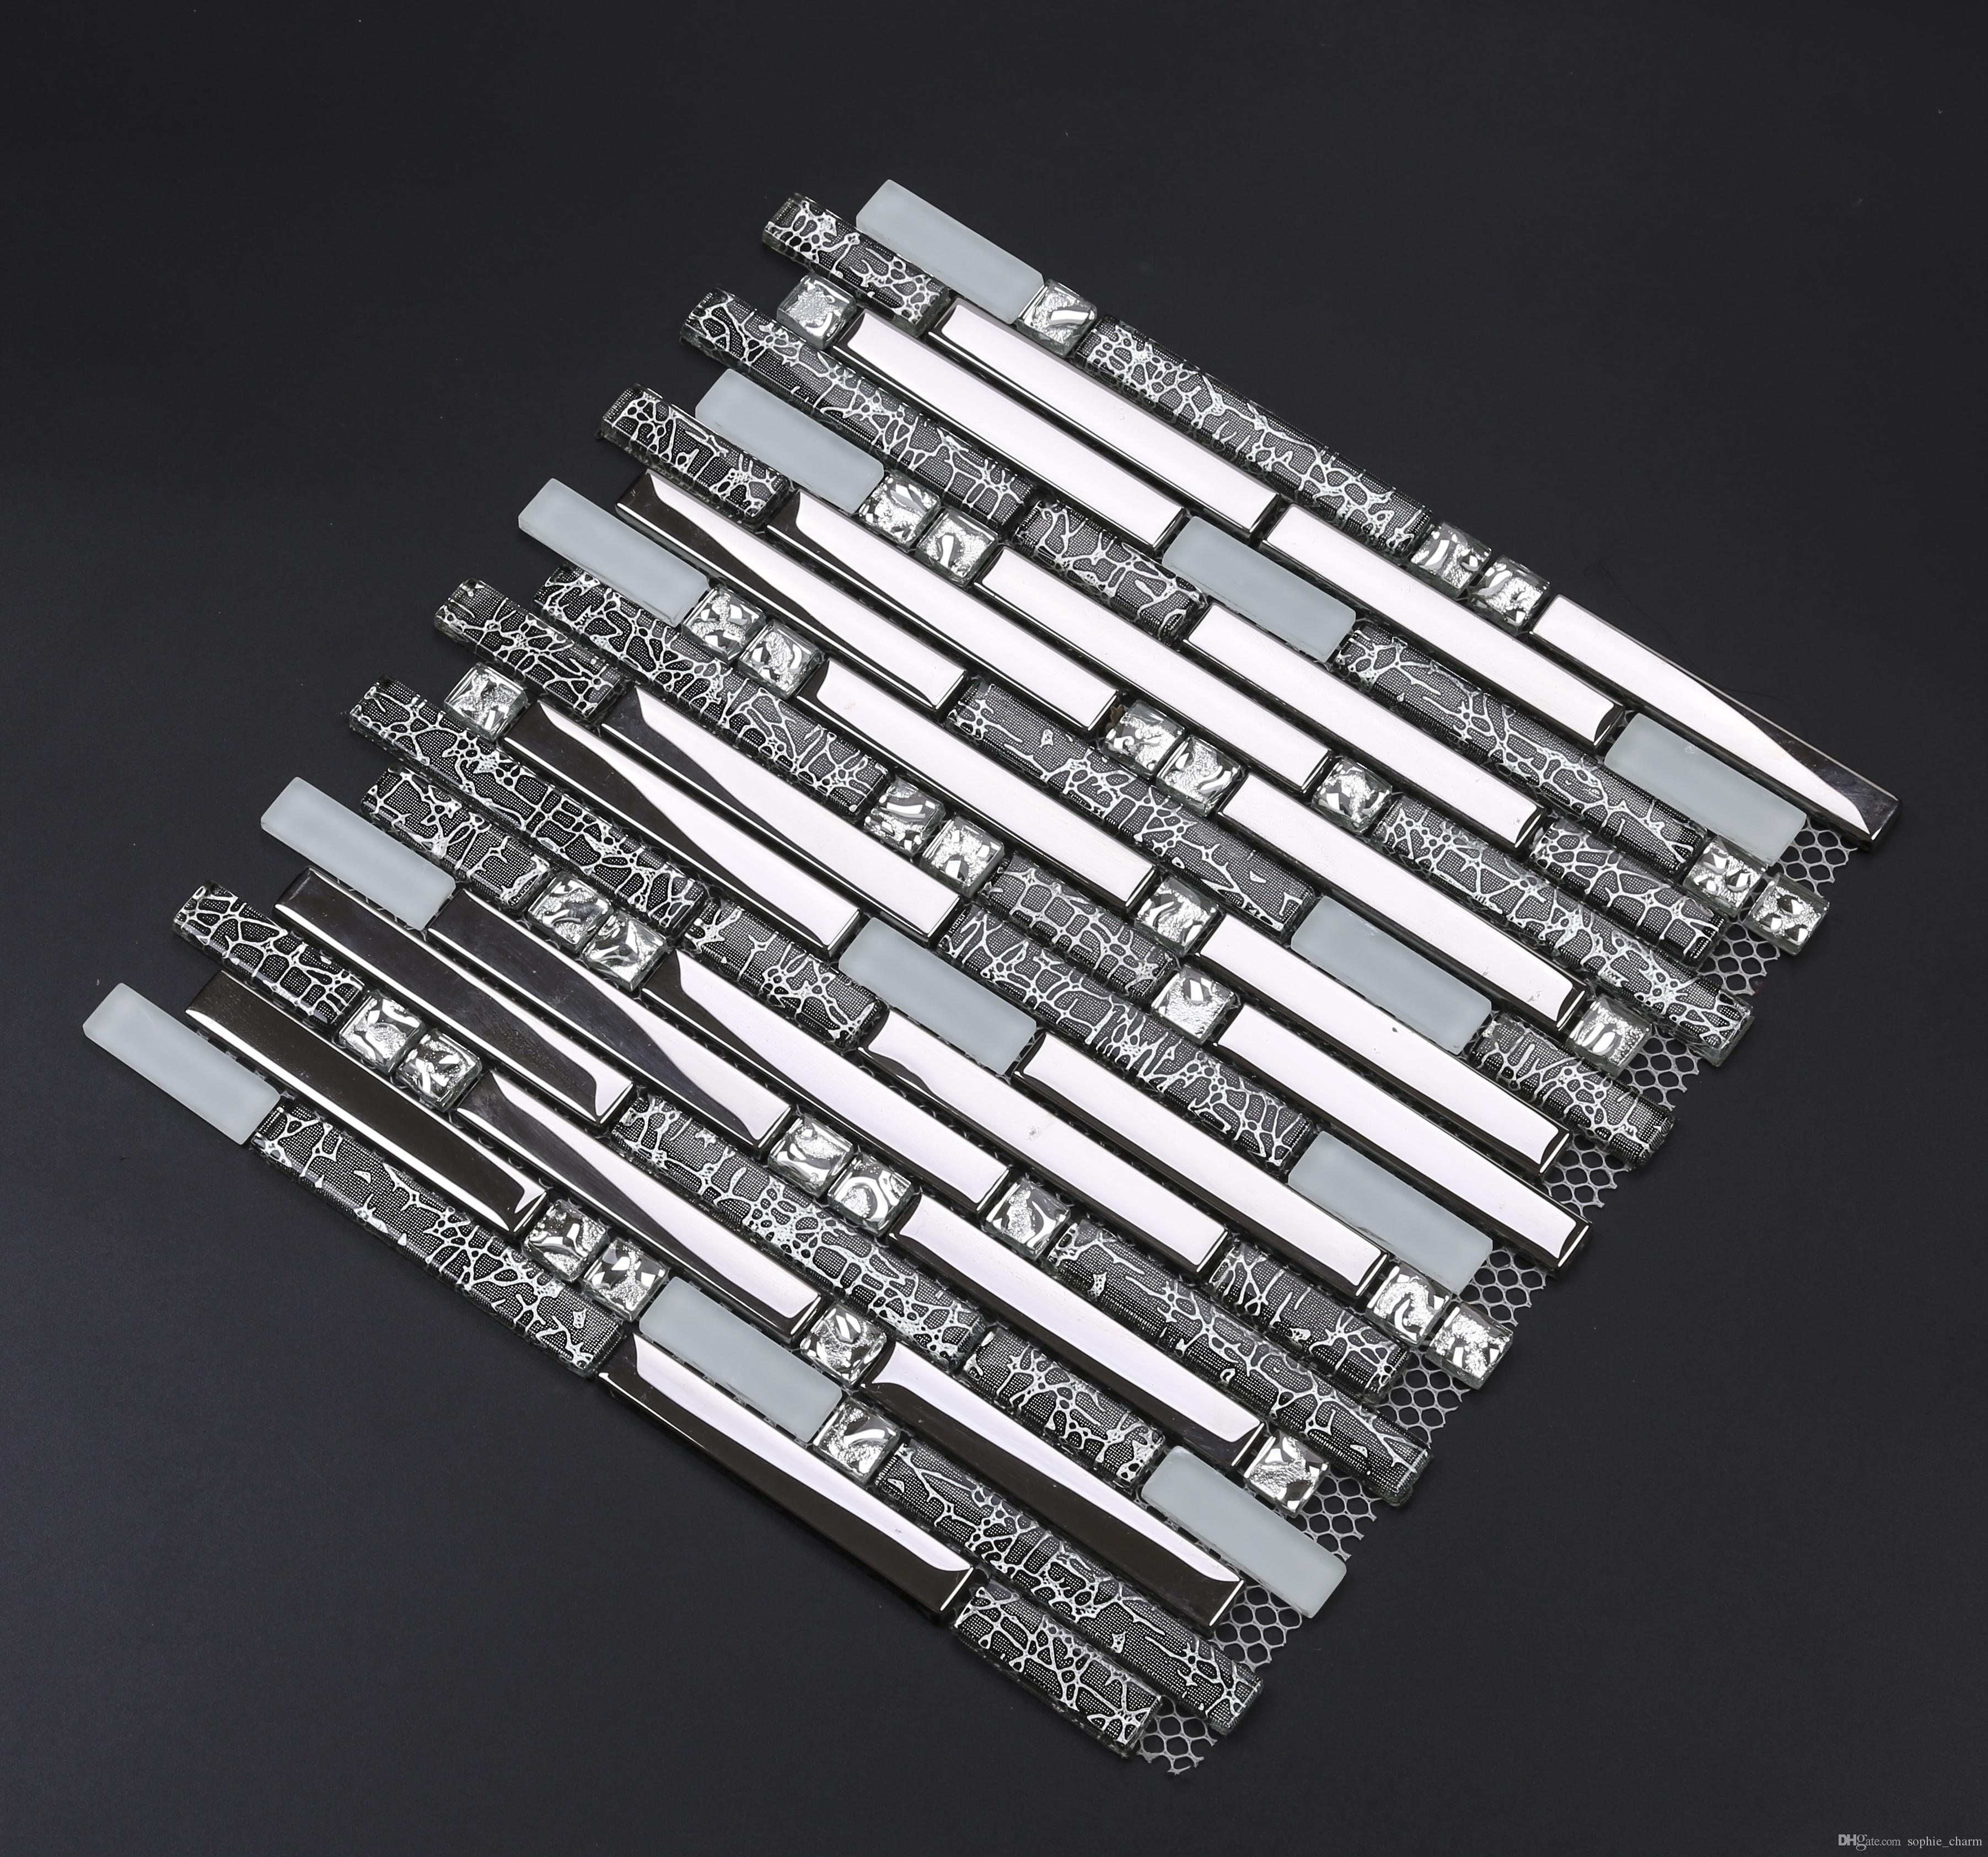 2020 Electroplated Silver Glass Mosaic Tile Backsplash Egmt005 Crystal White Black Glass Mosaic Wall Tiles Bathroom From Sophie Charm 14 57 Dhgate Com